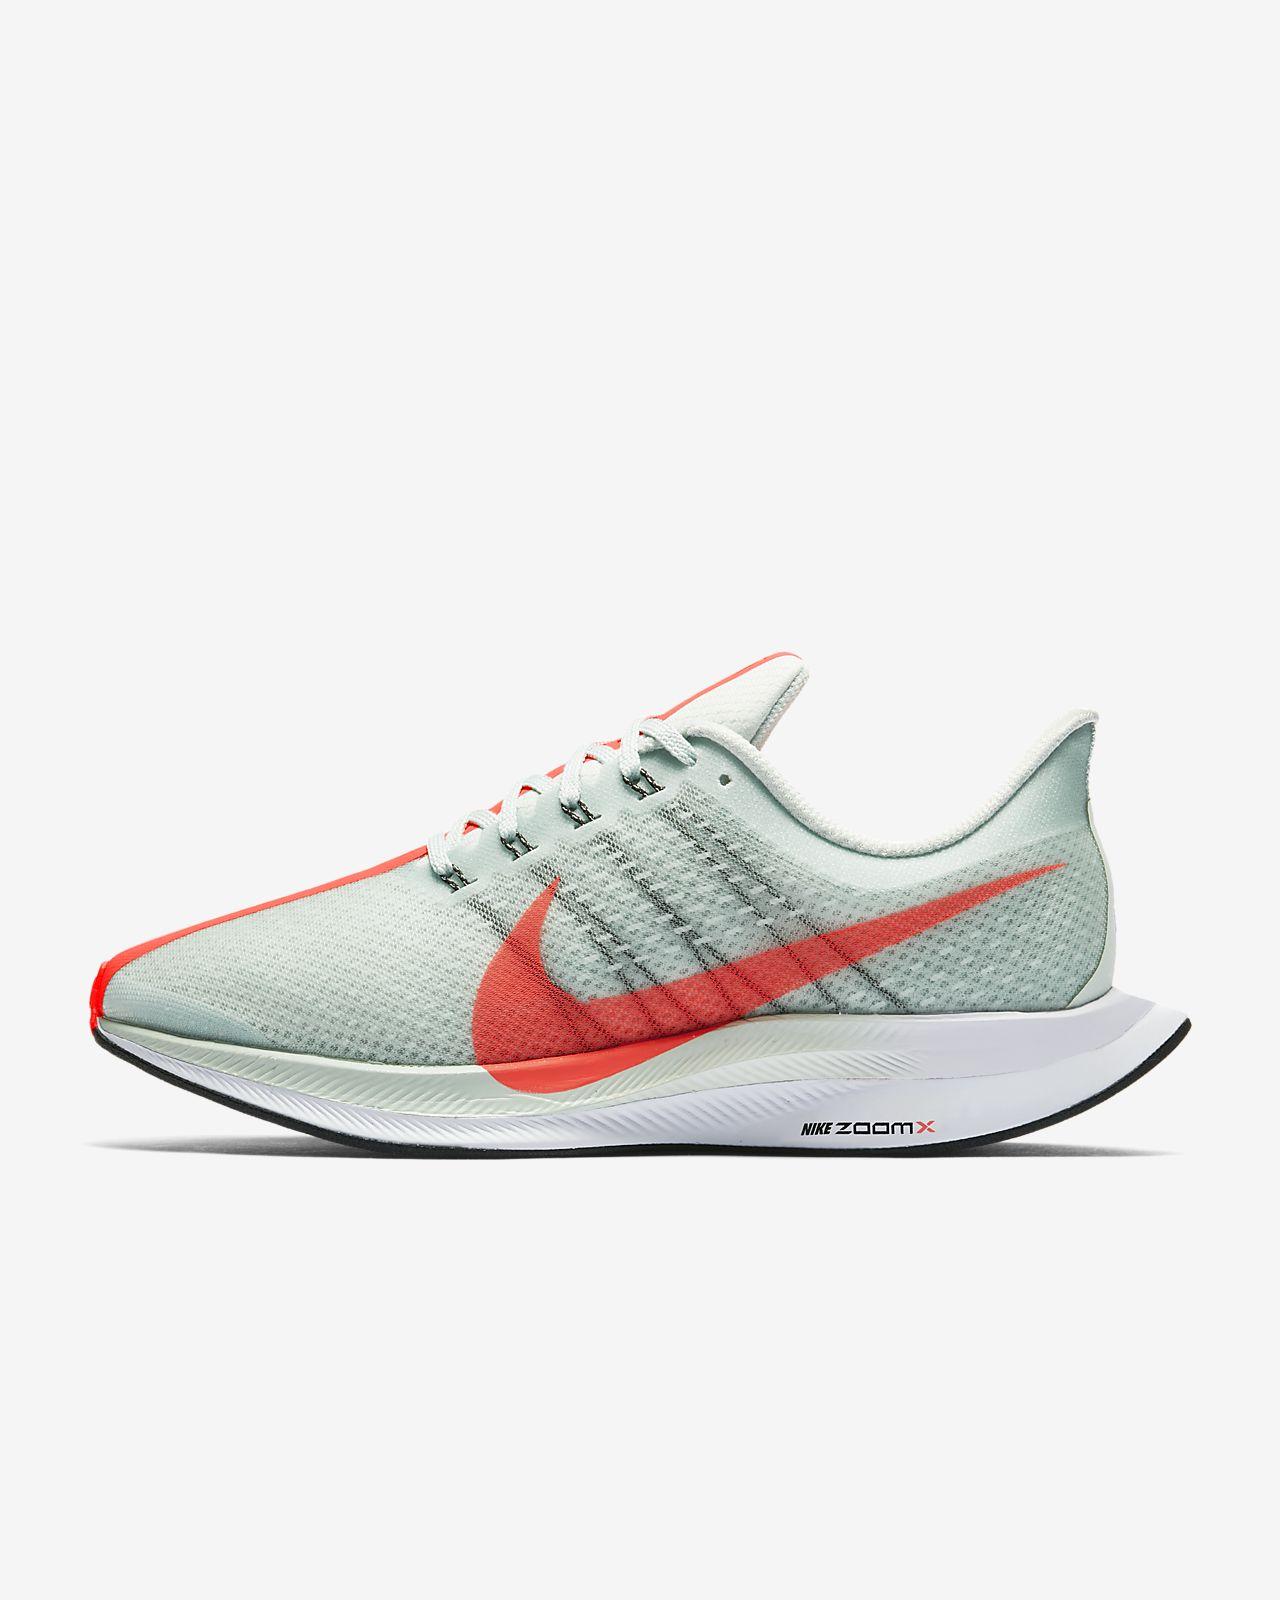 the best attitude 7aa8b a5e46 Nike Zoom Pegasus Turbo Hardloopschoen voor dames. Nike.com NL